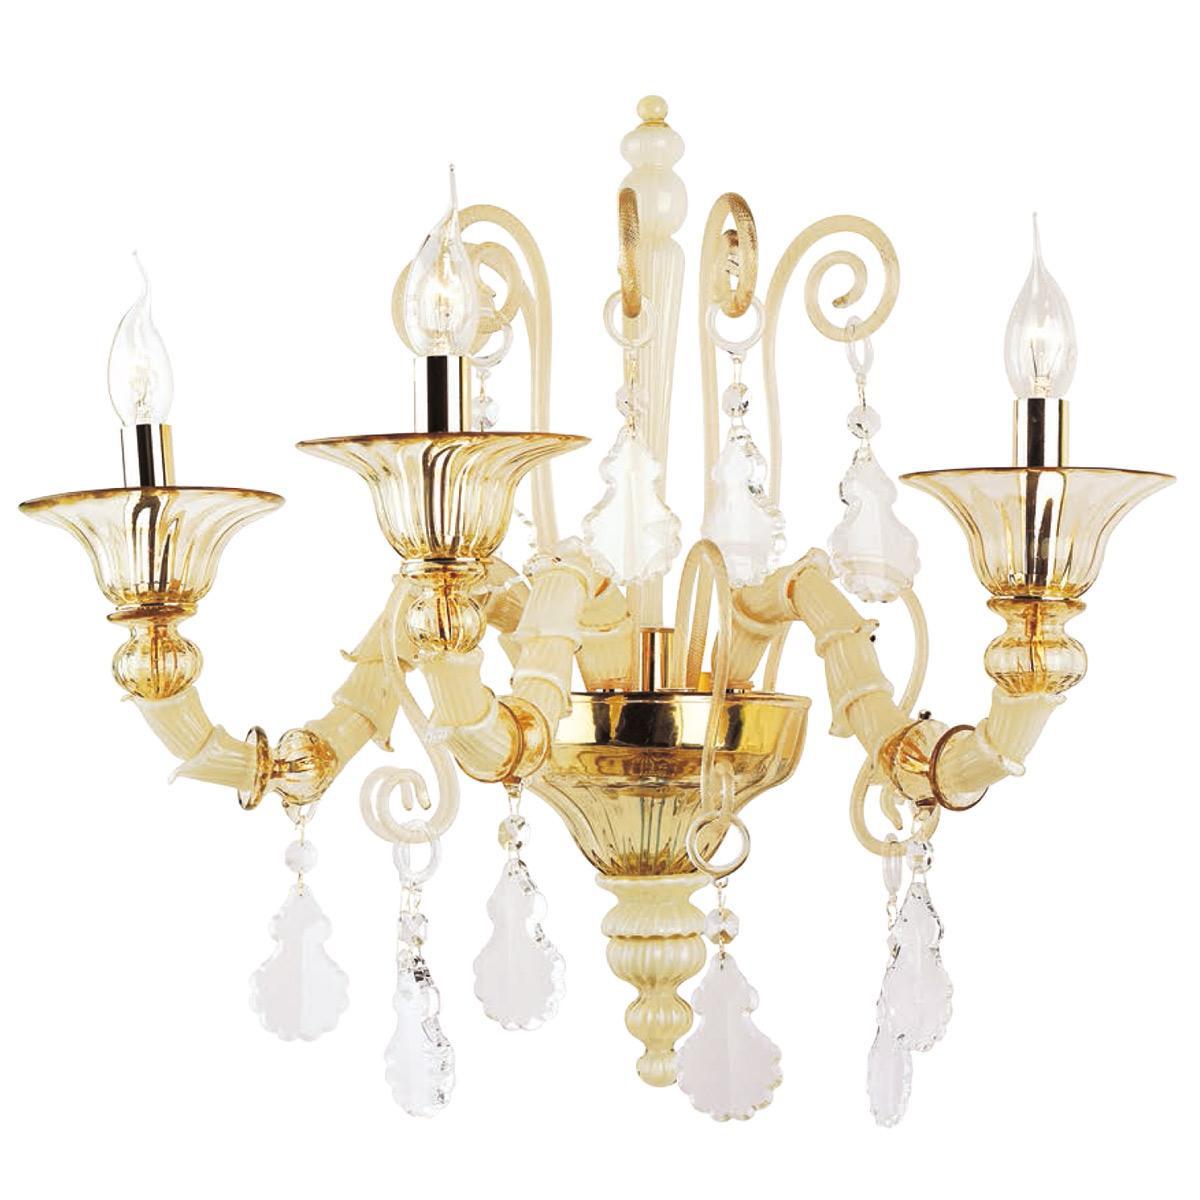 """Irene"" Murano glass sconce - 3 lights -"